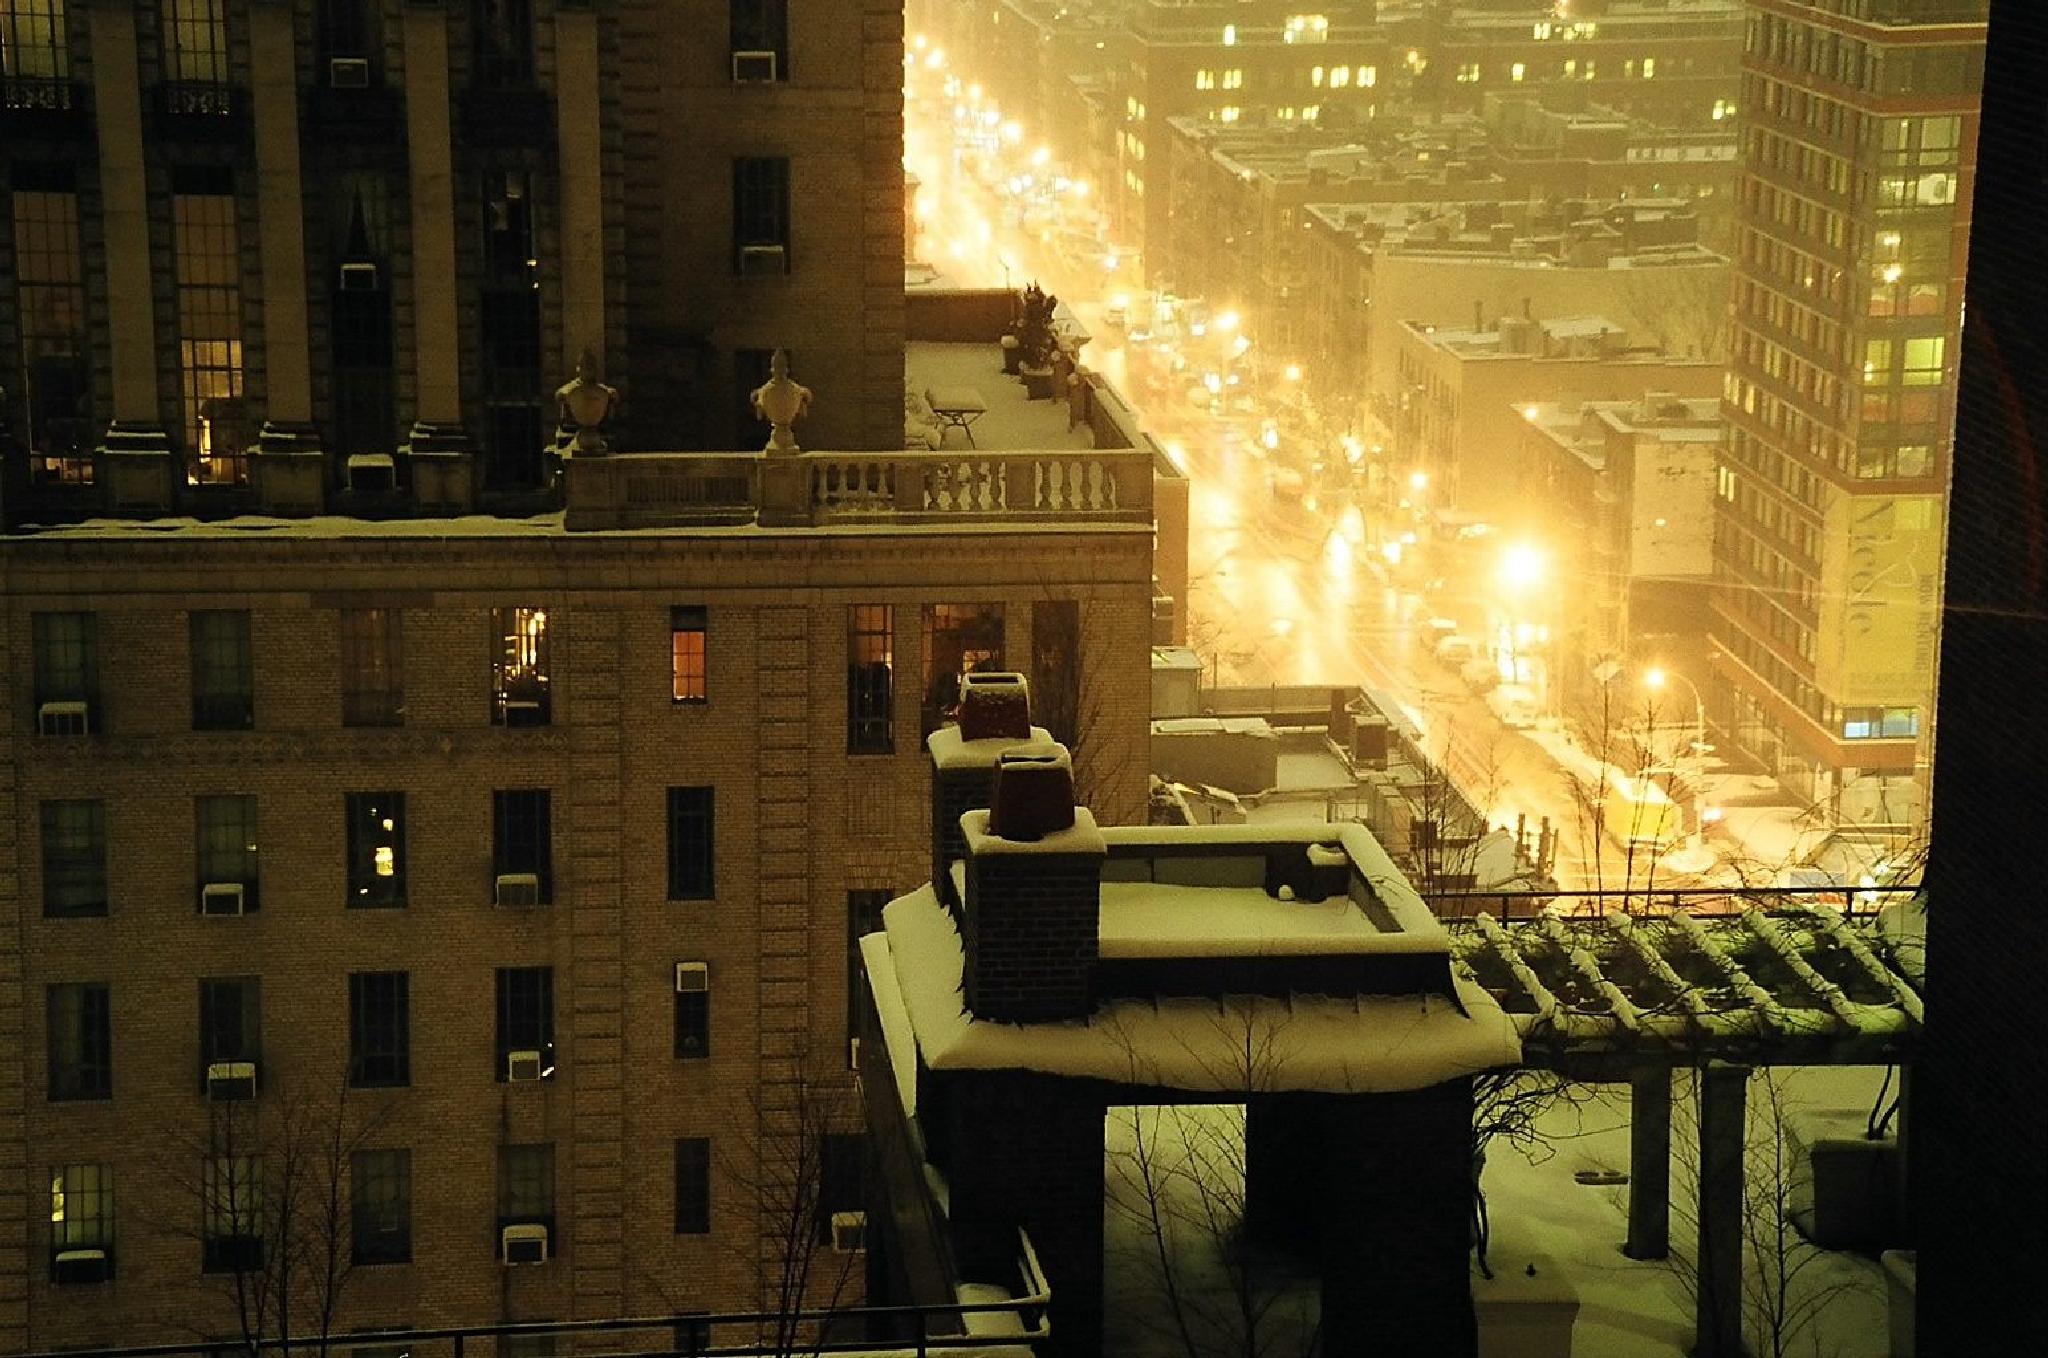 Ninth Avenue by John King